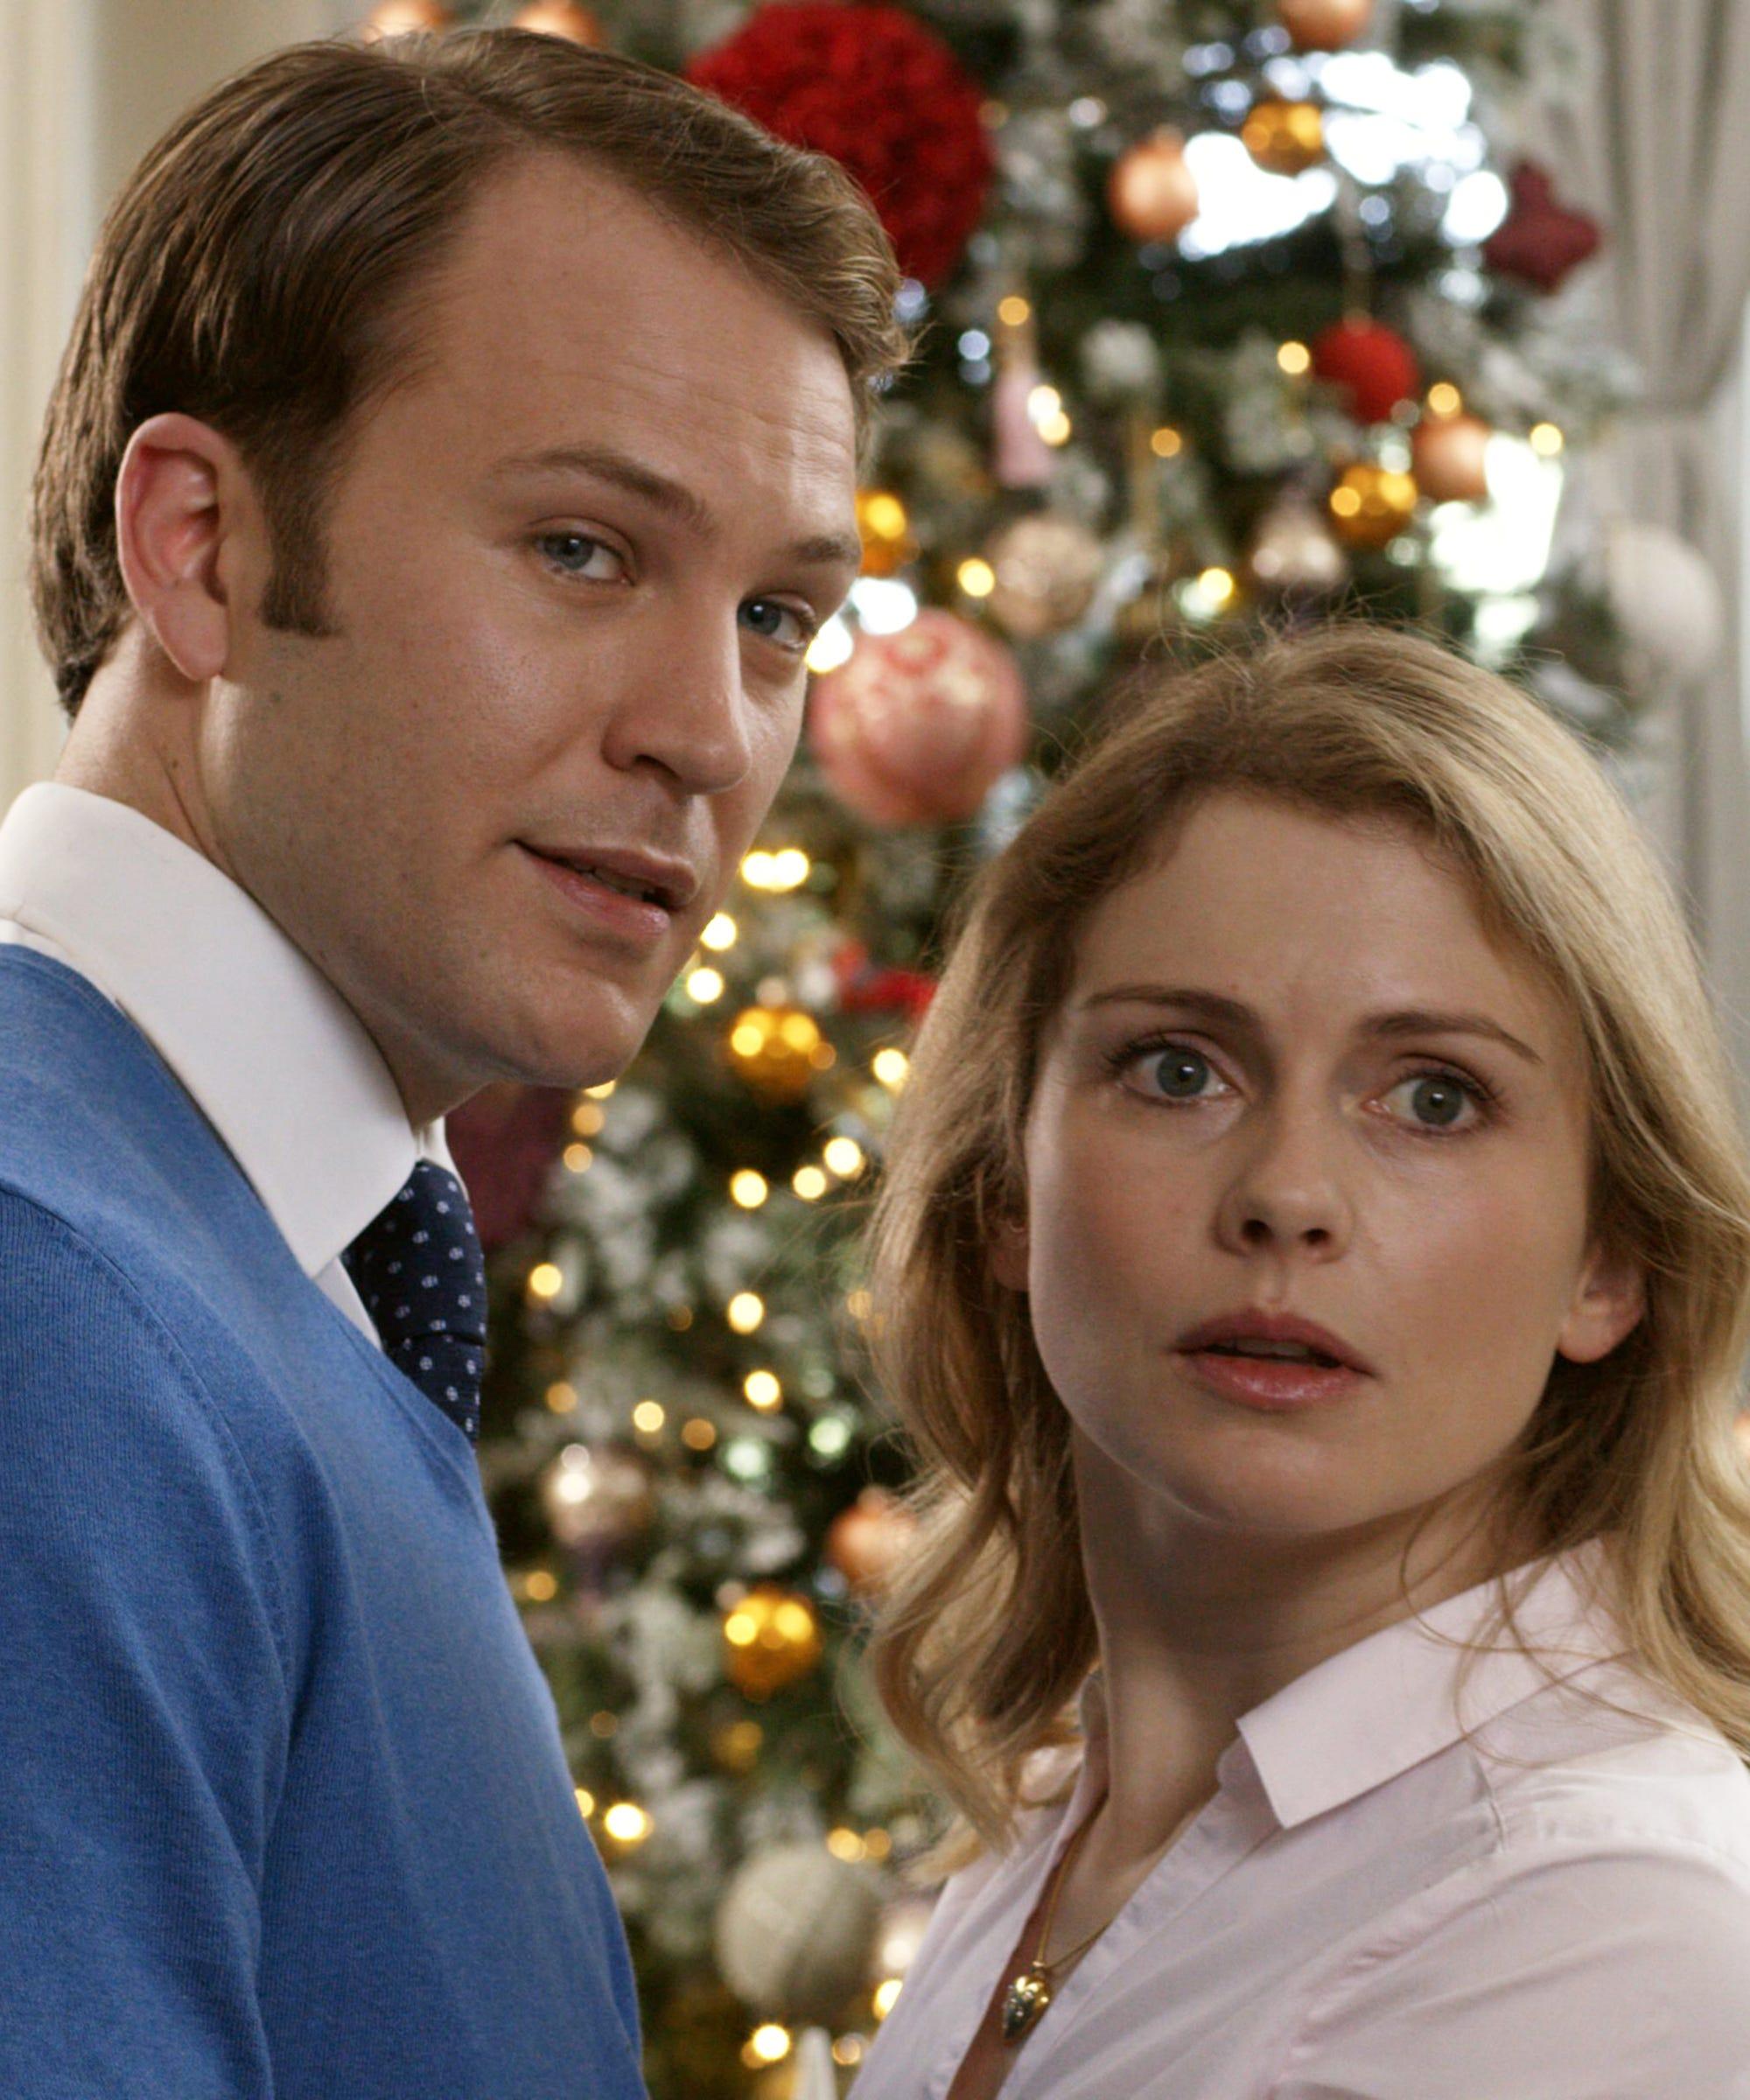 A Christmas Prince Royal Wedding Cast Guide To Sequel